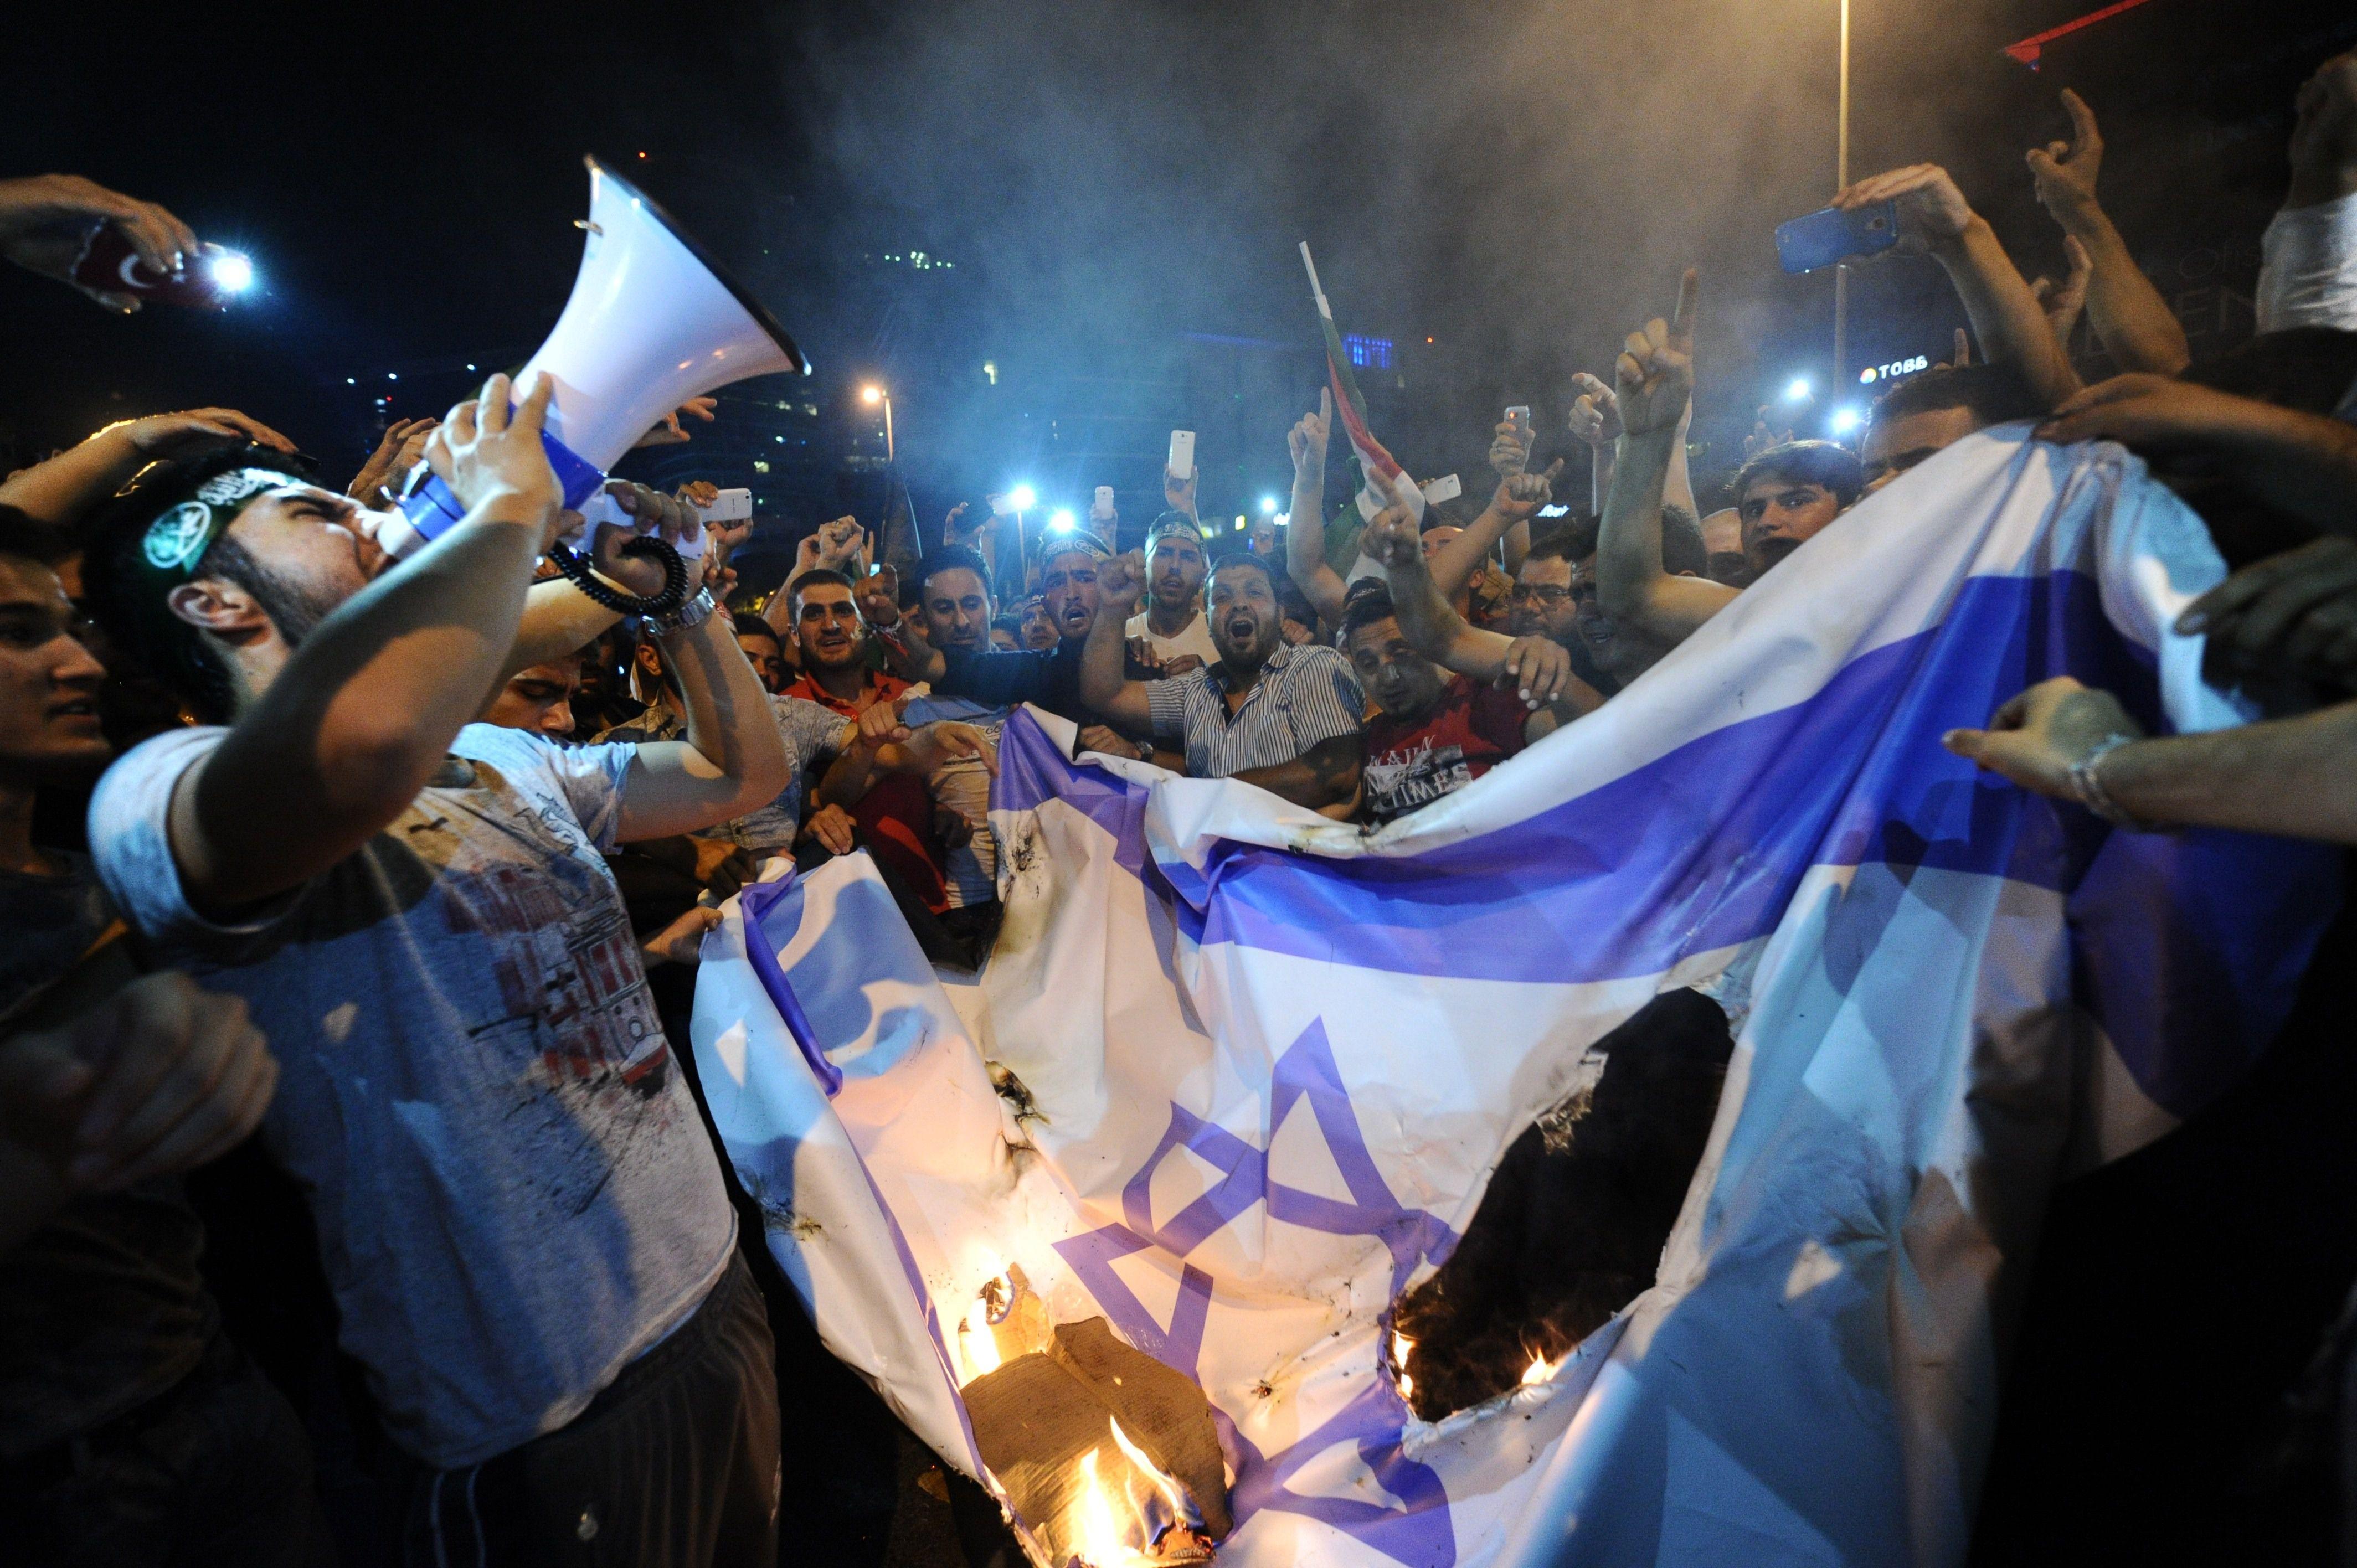 Turkish protestors burn Israeli flag during demonstration against the Gaza War in 2014.